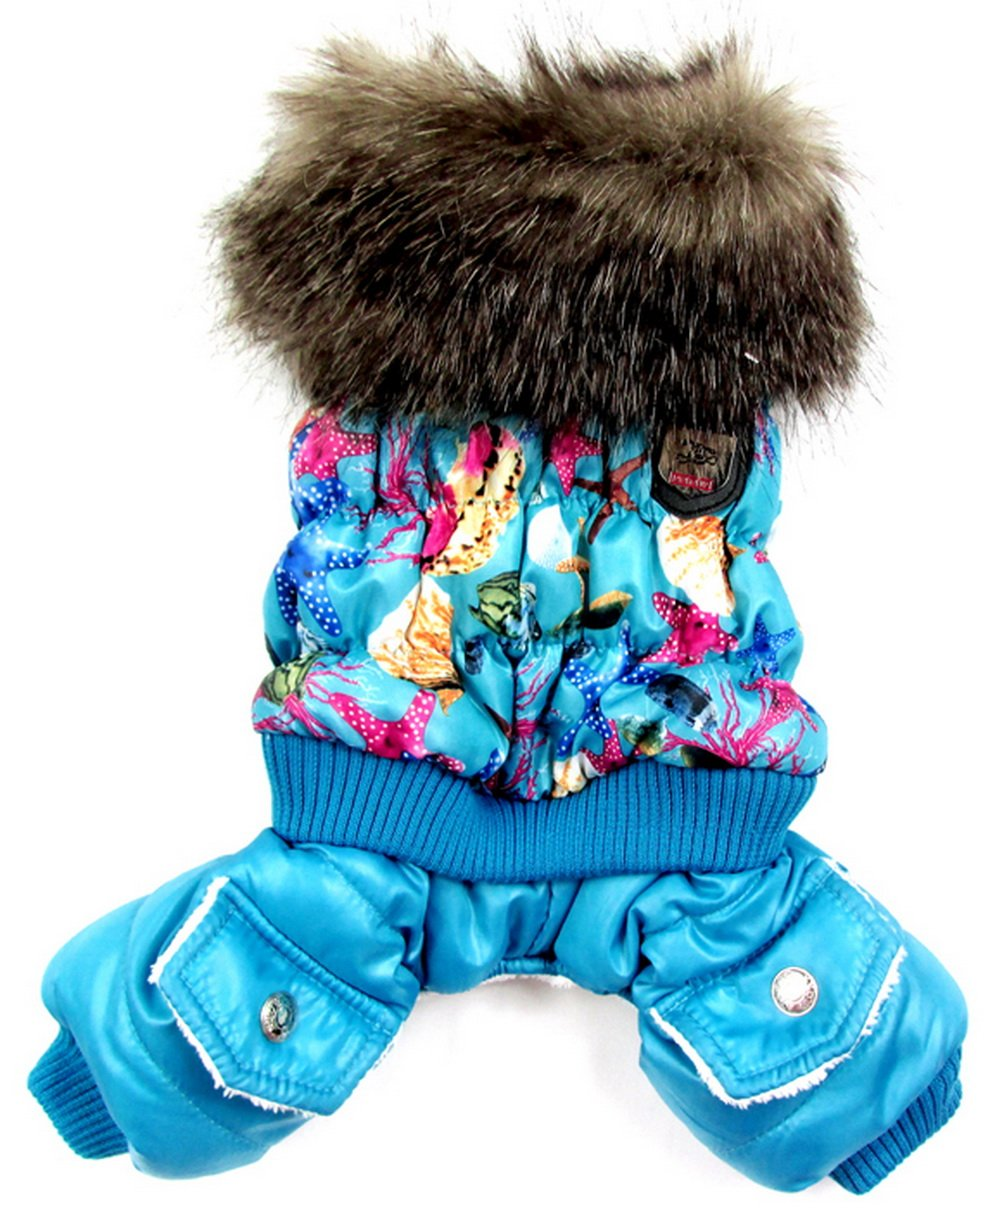 PETLOVE Starfish Animal Print Small Dog Clothes Dog Winter Coat Fleece Lined Dog Jumpsuit Purple S